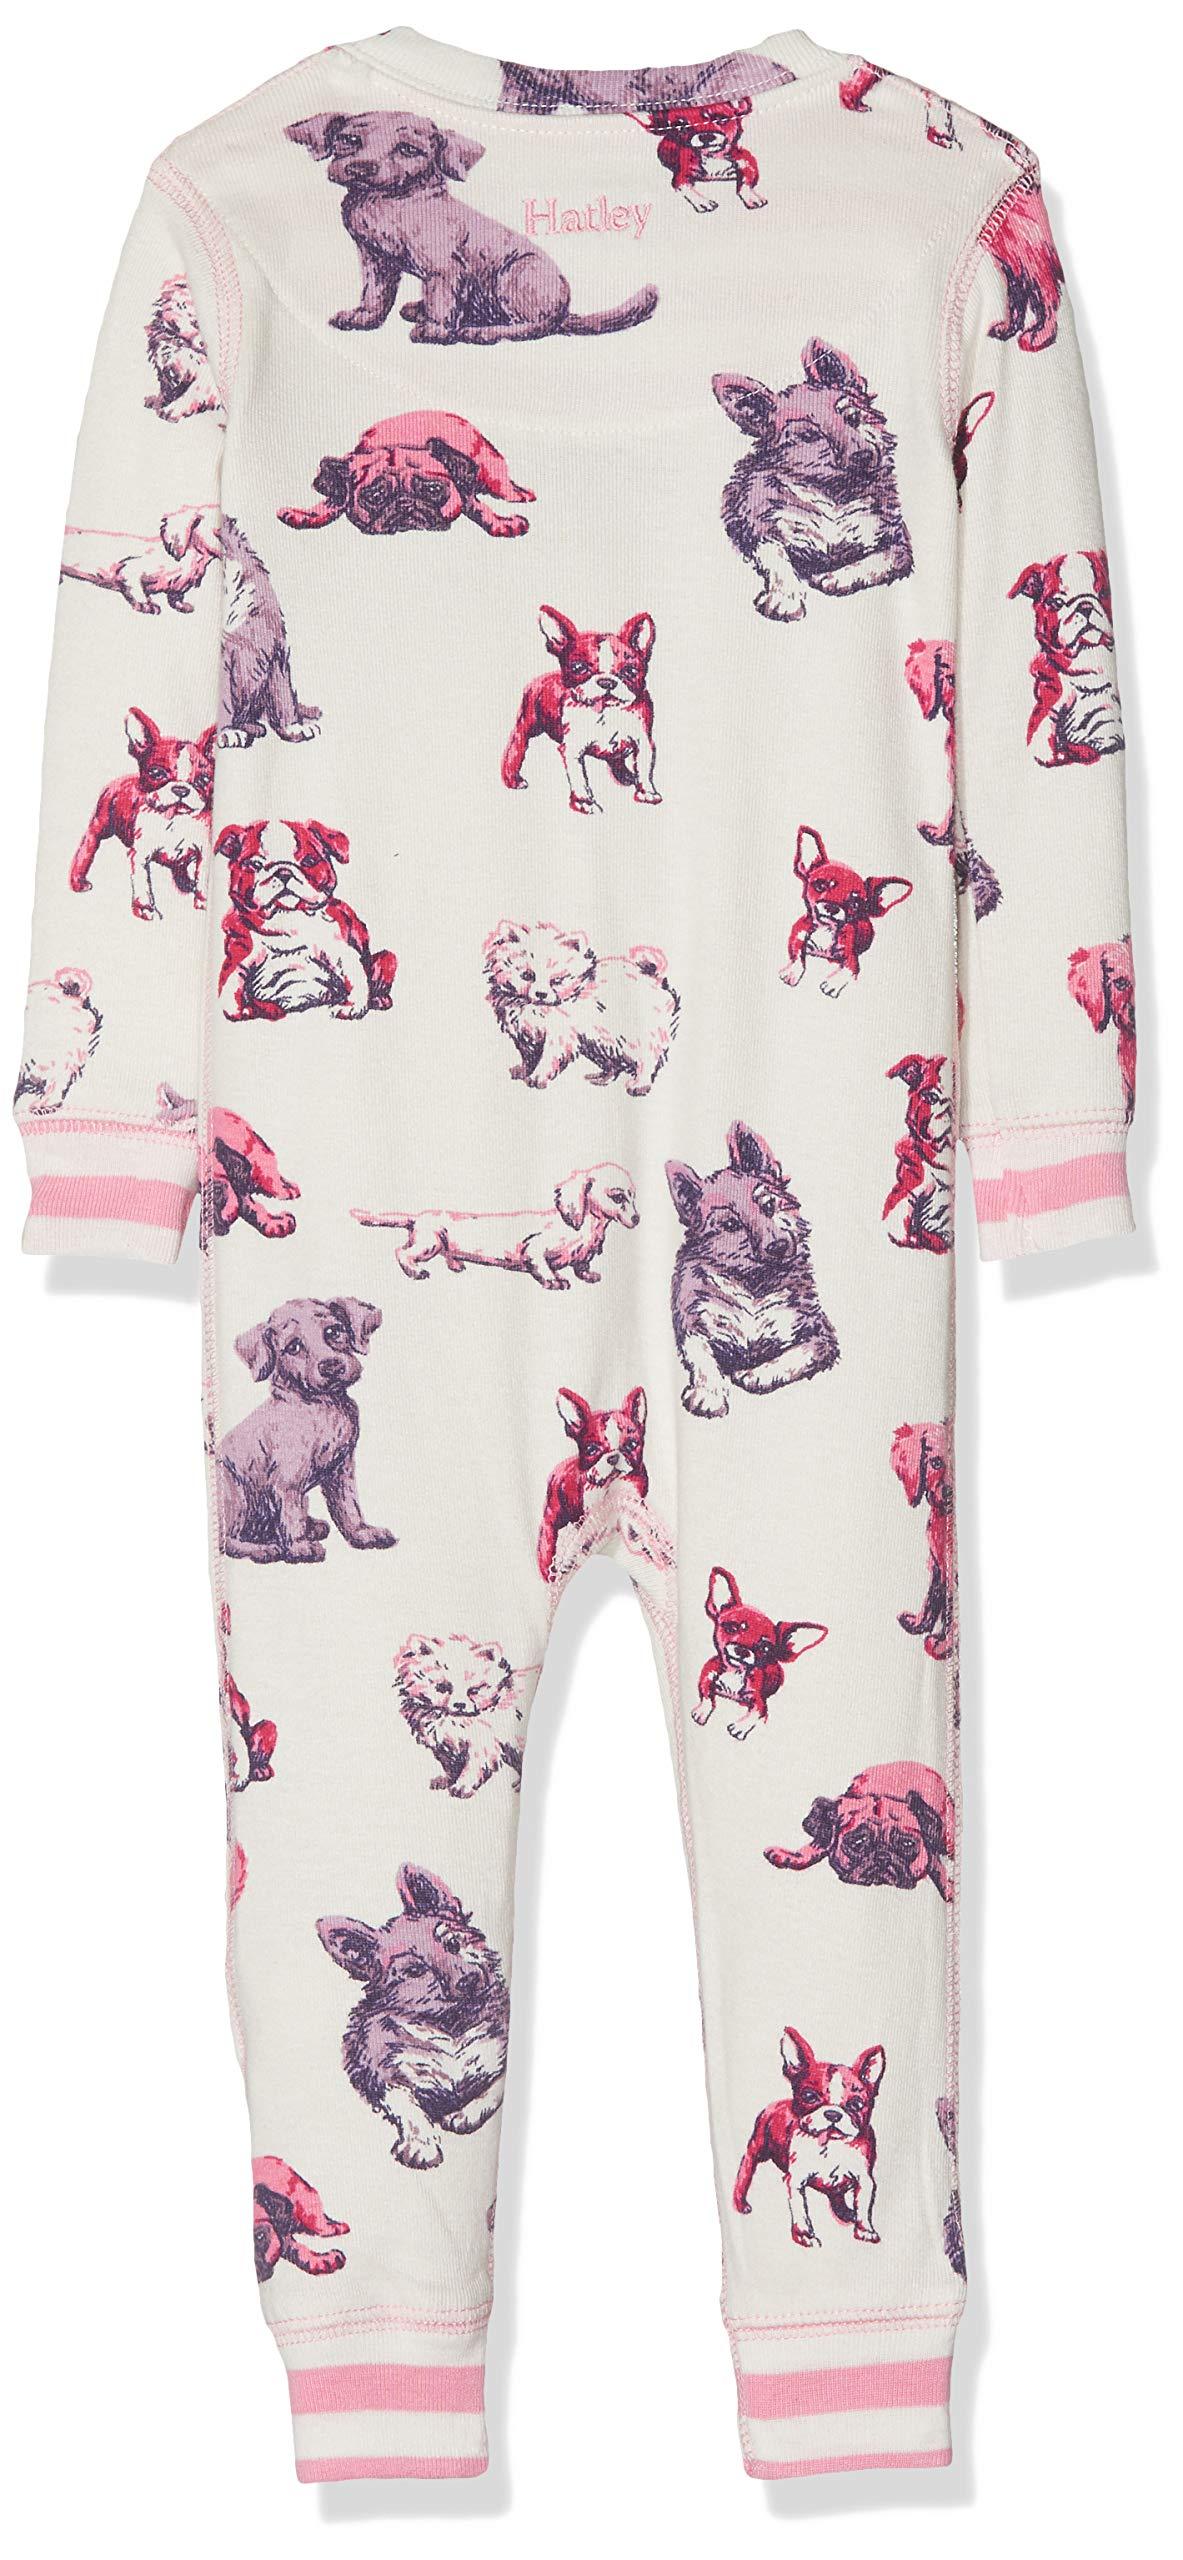 Hatley Organic Cotton Sleepsuits Pelele para Dormir para Bebés 2